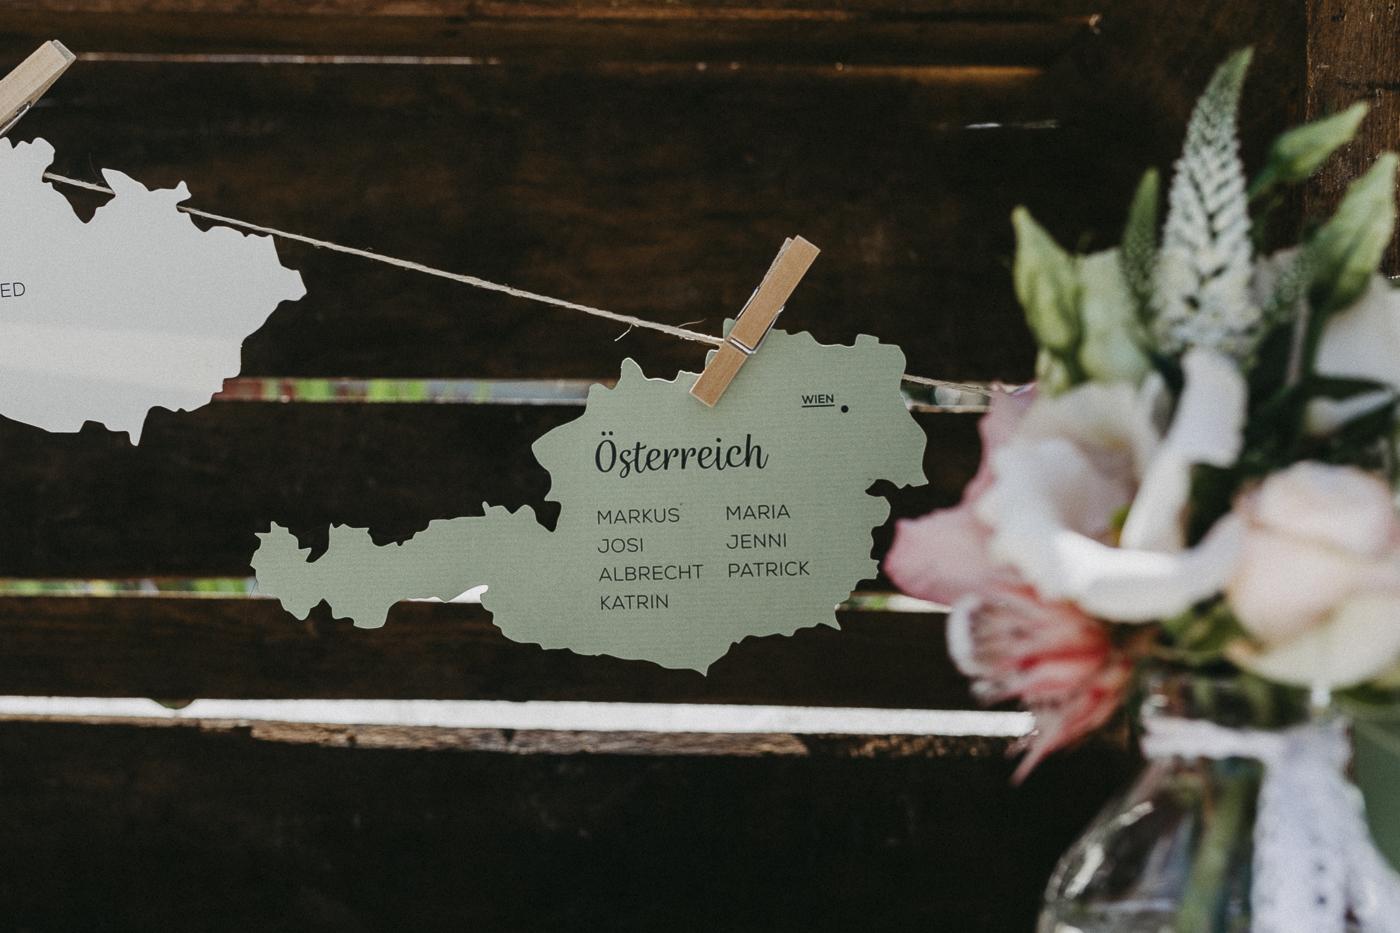 rosemarrylemon_ND_Hochzeit_Tischplan2.jpg